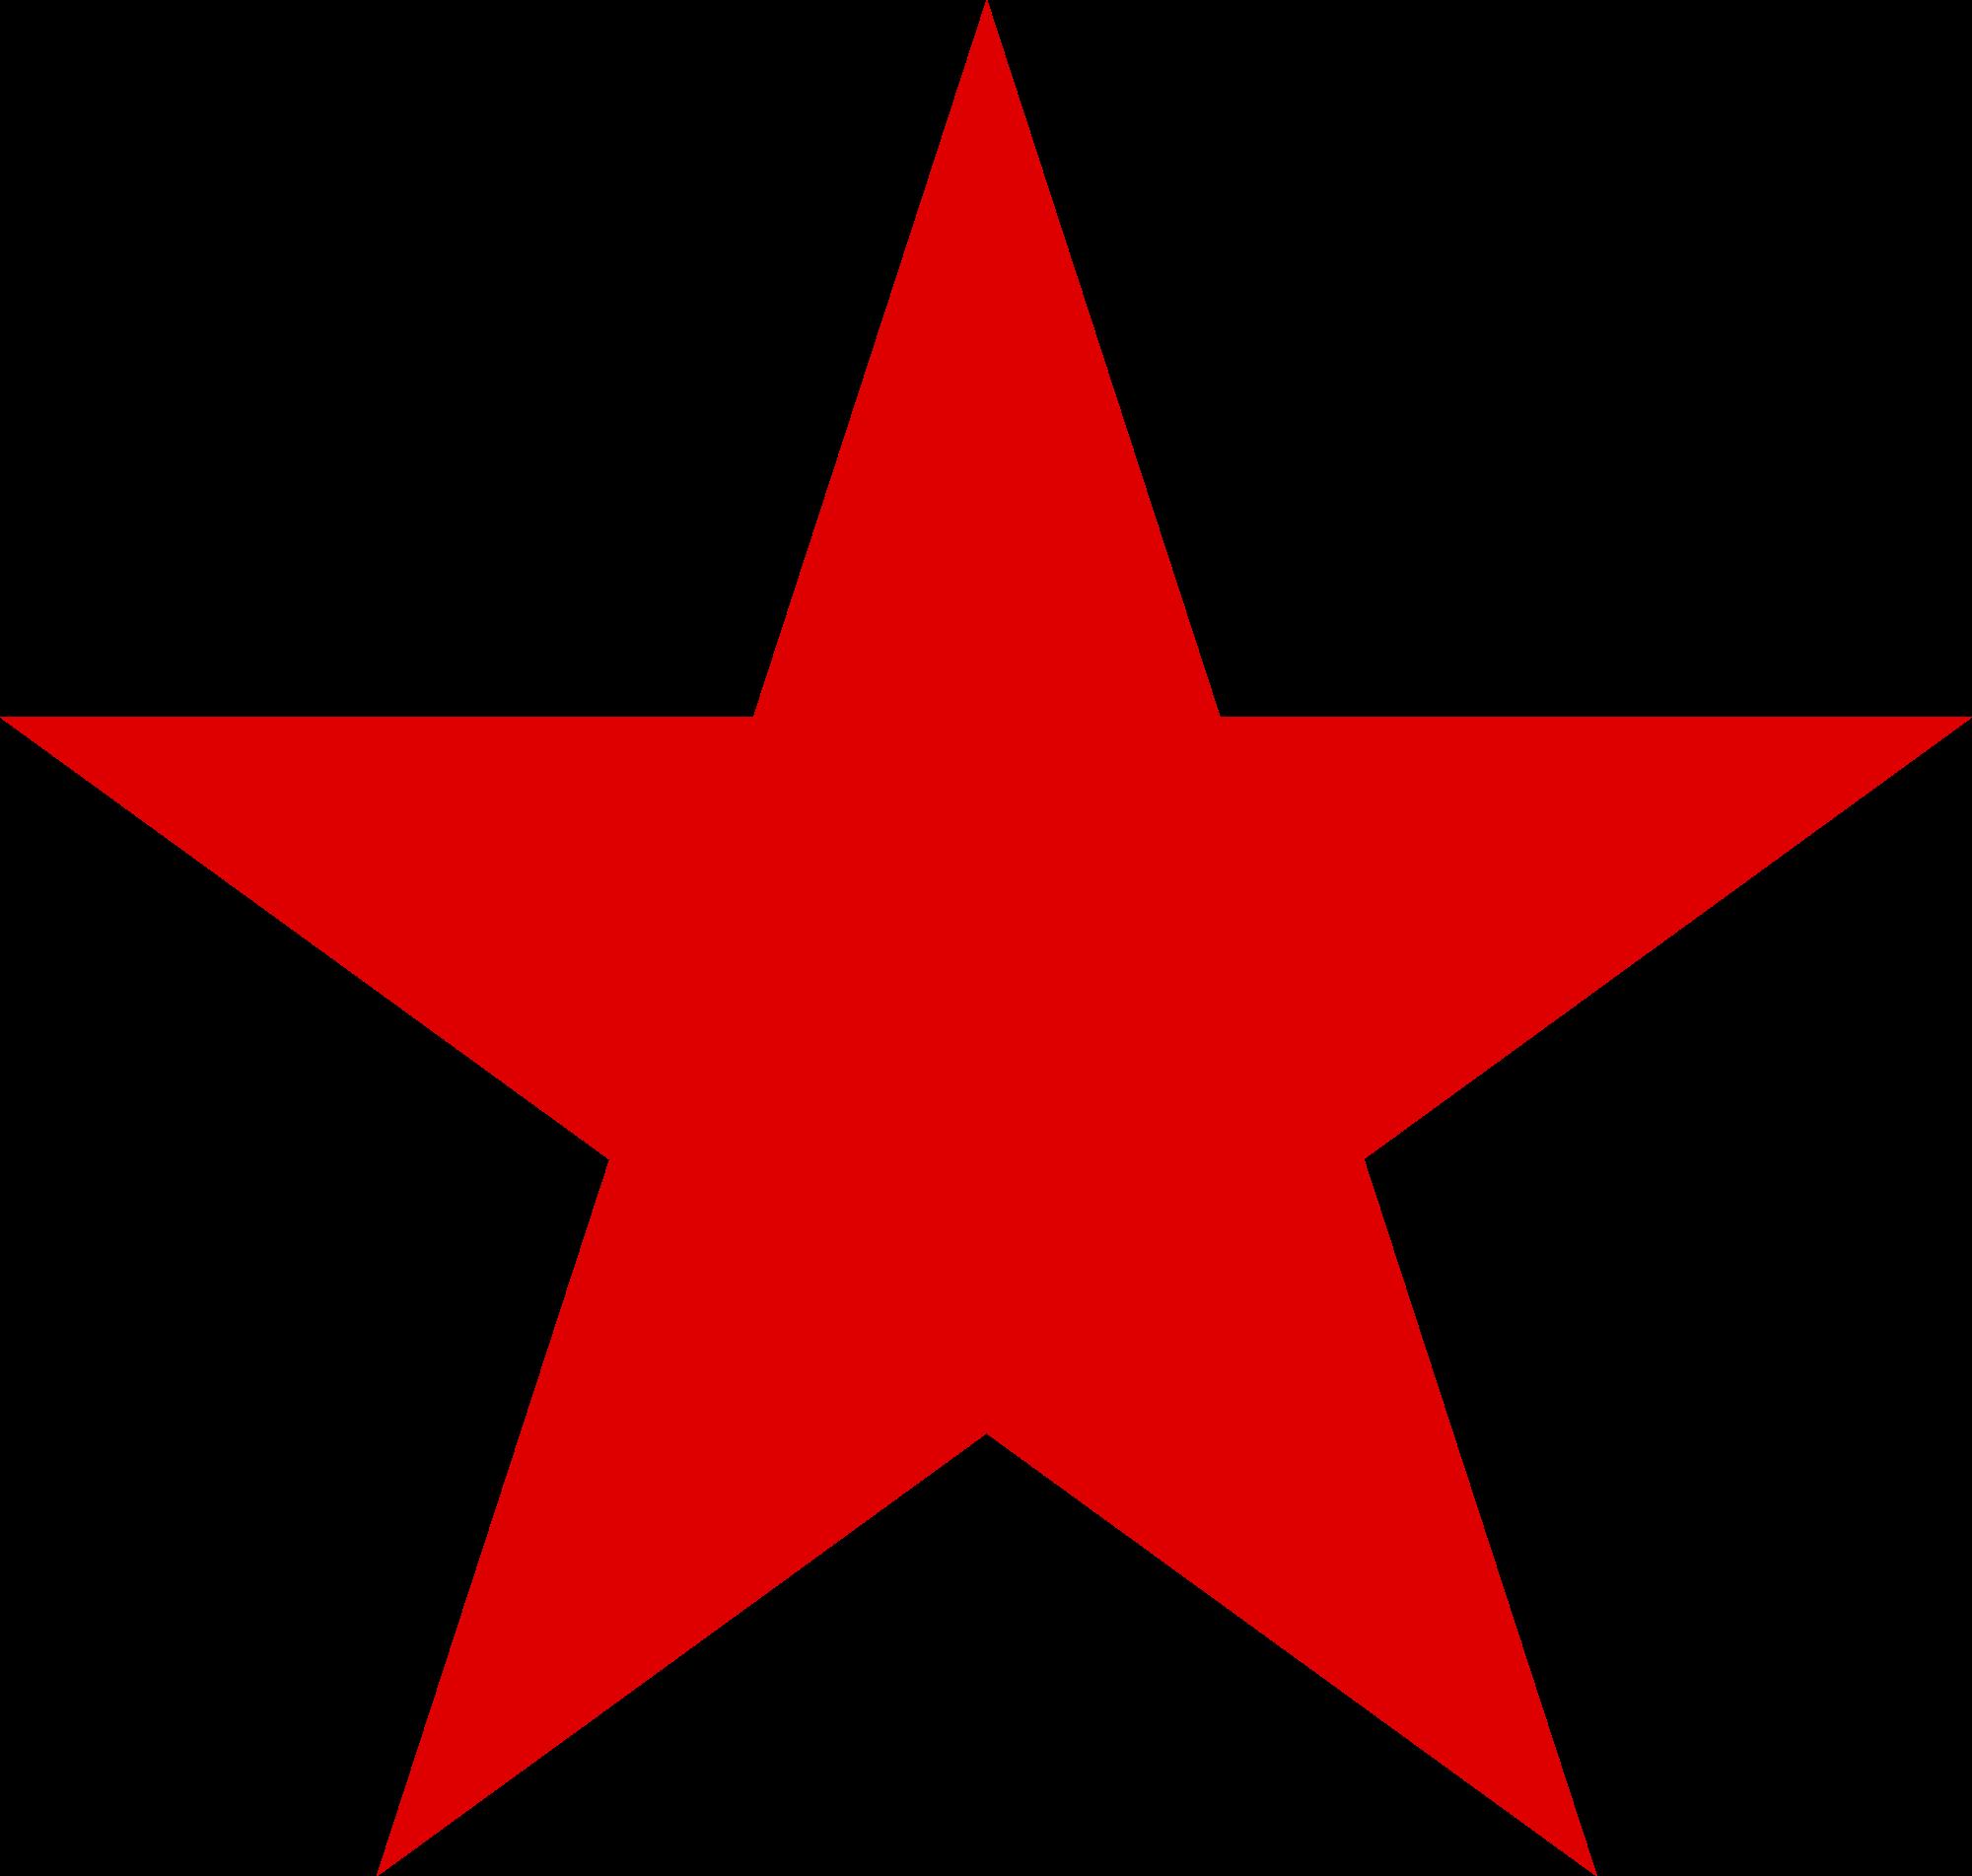 Red star.